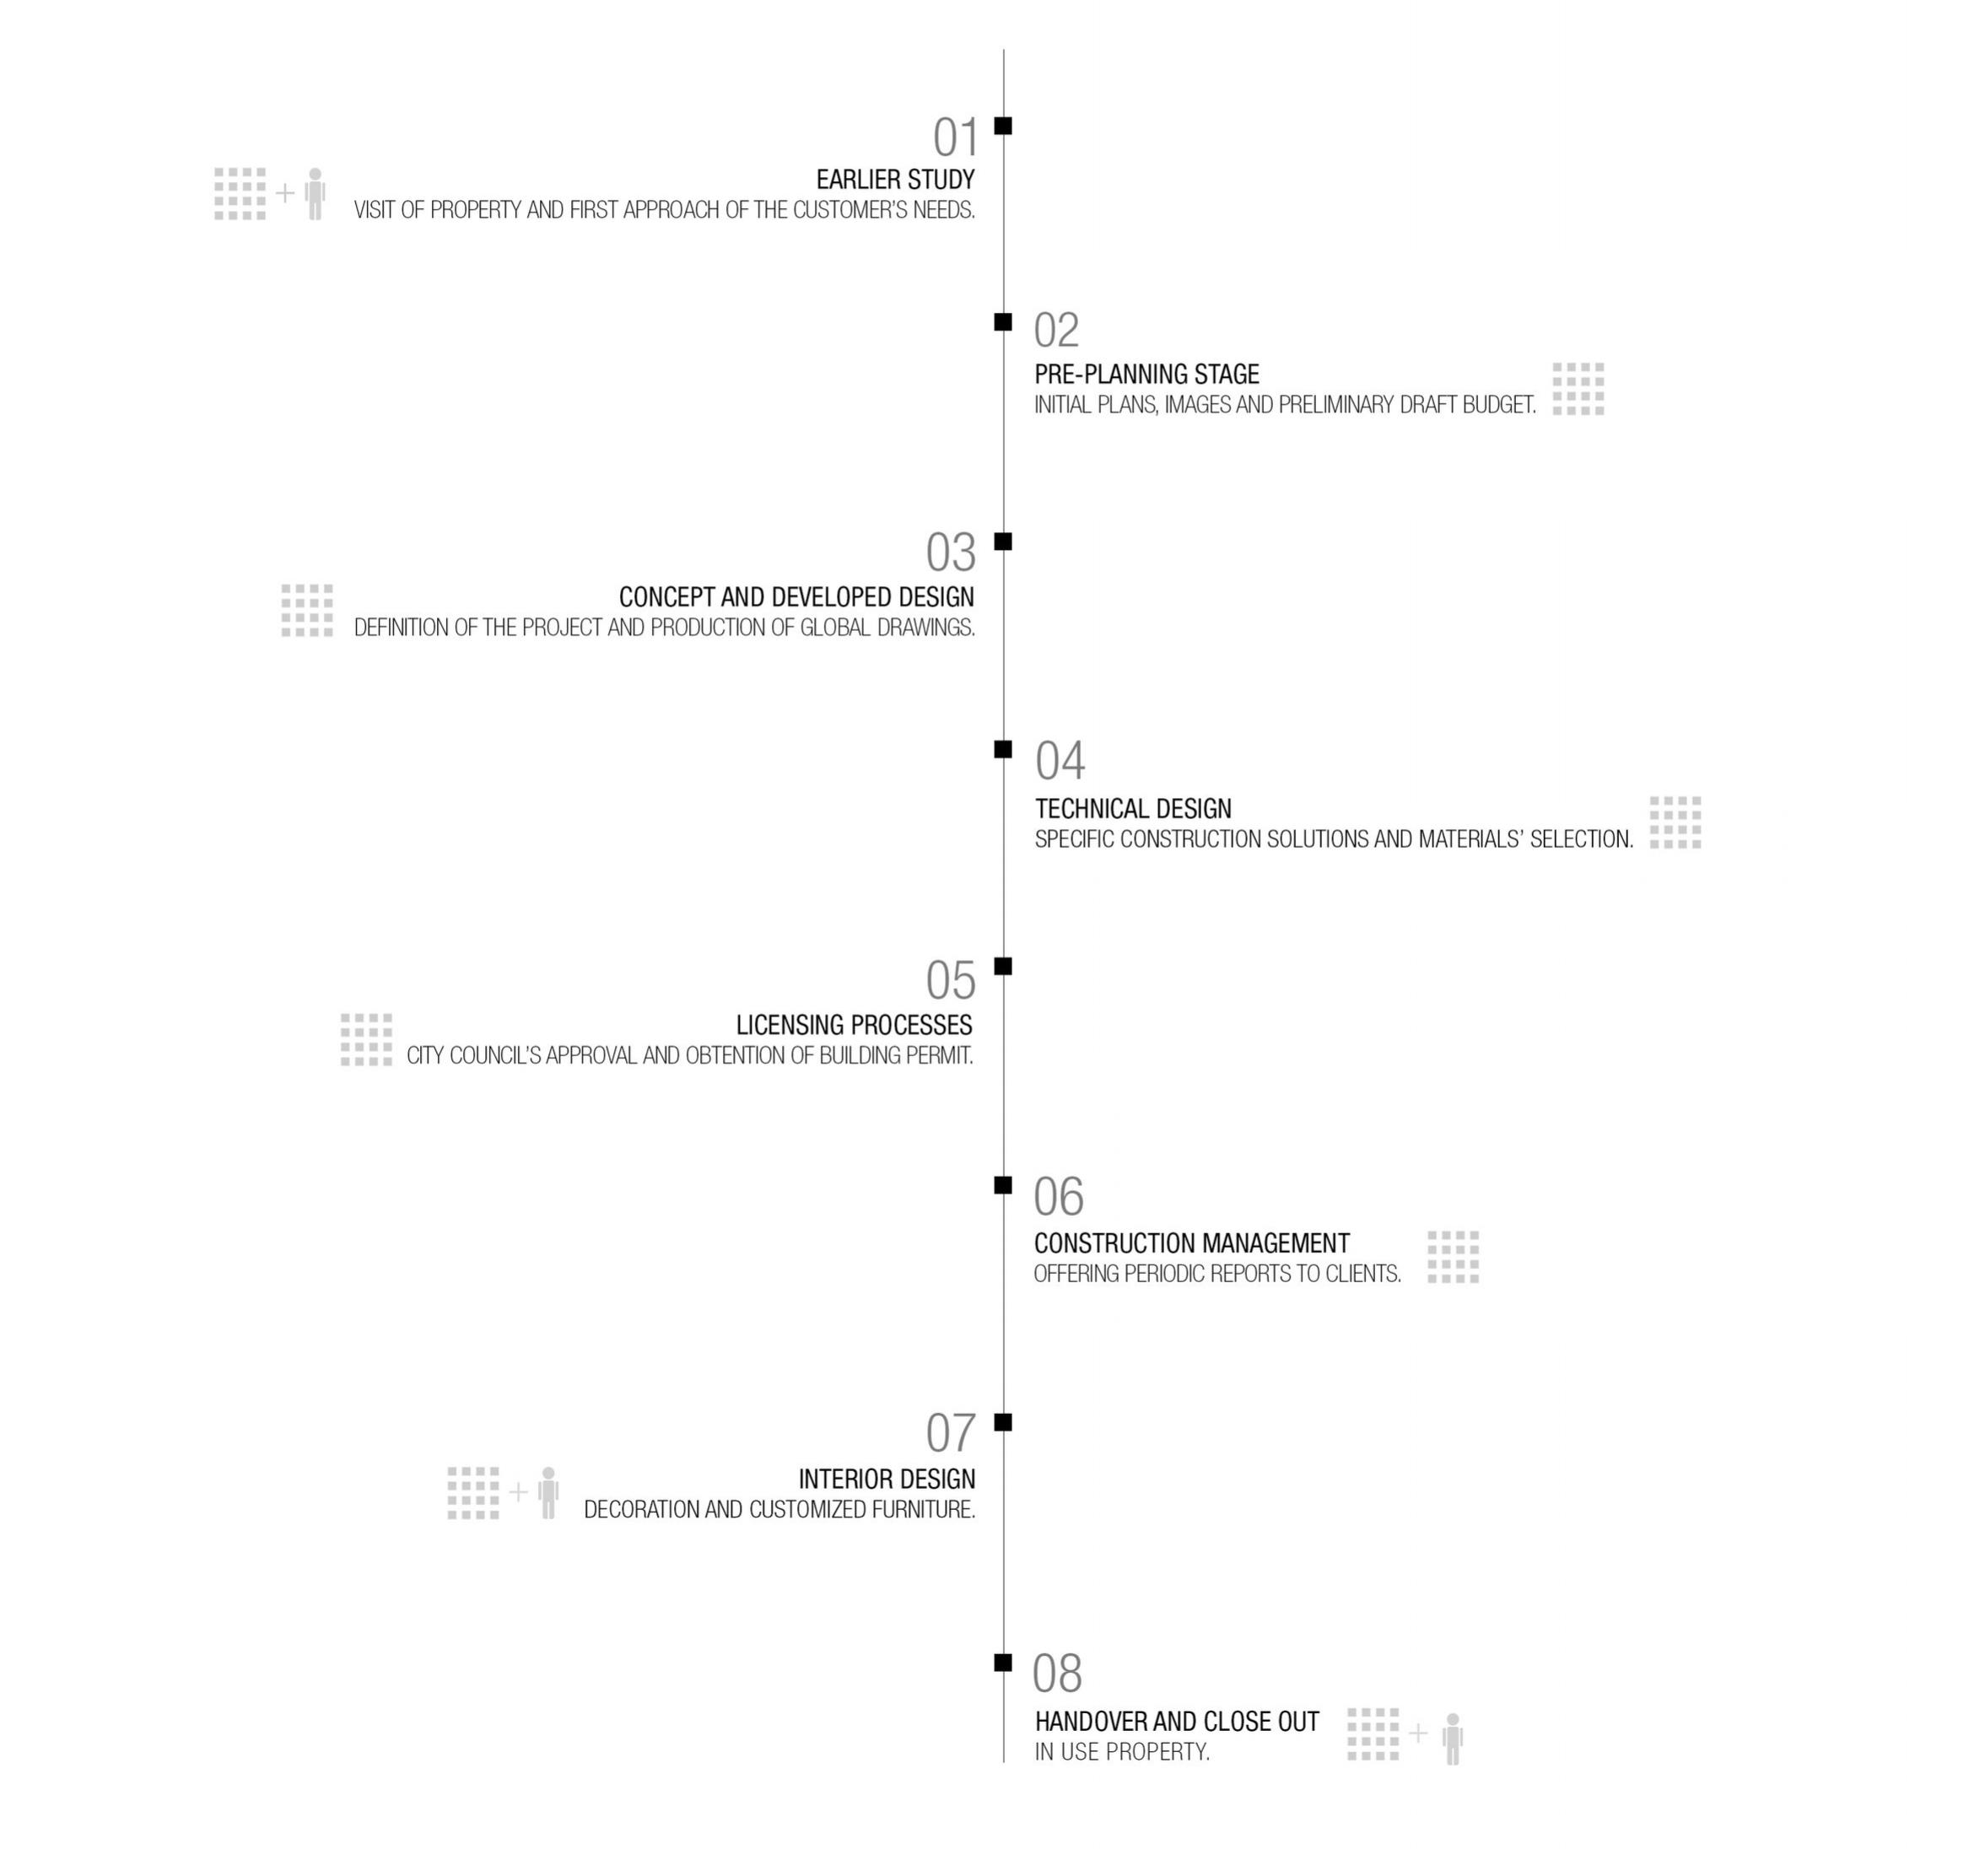 Time line for householders